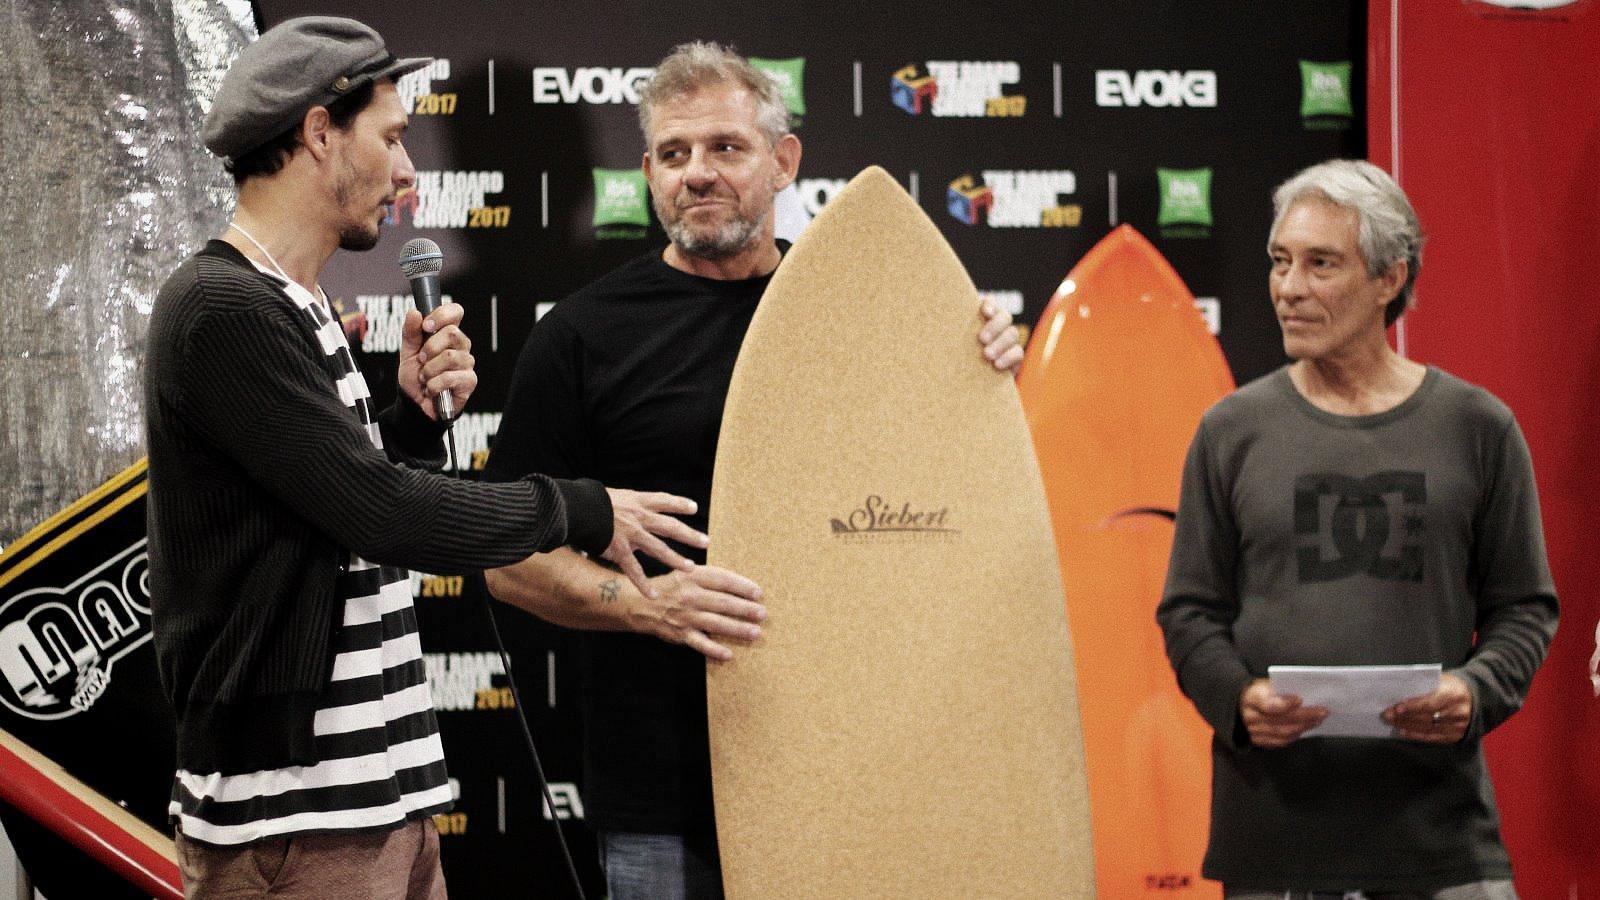 Felipe Siebert Recebendo Prêmio